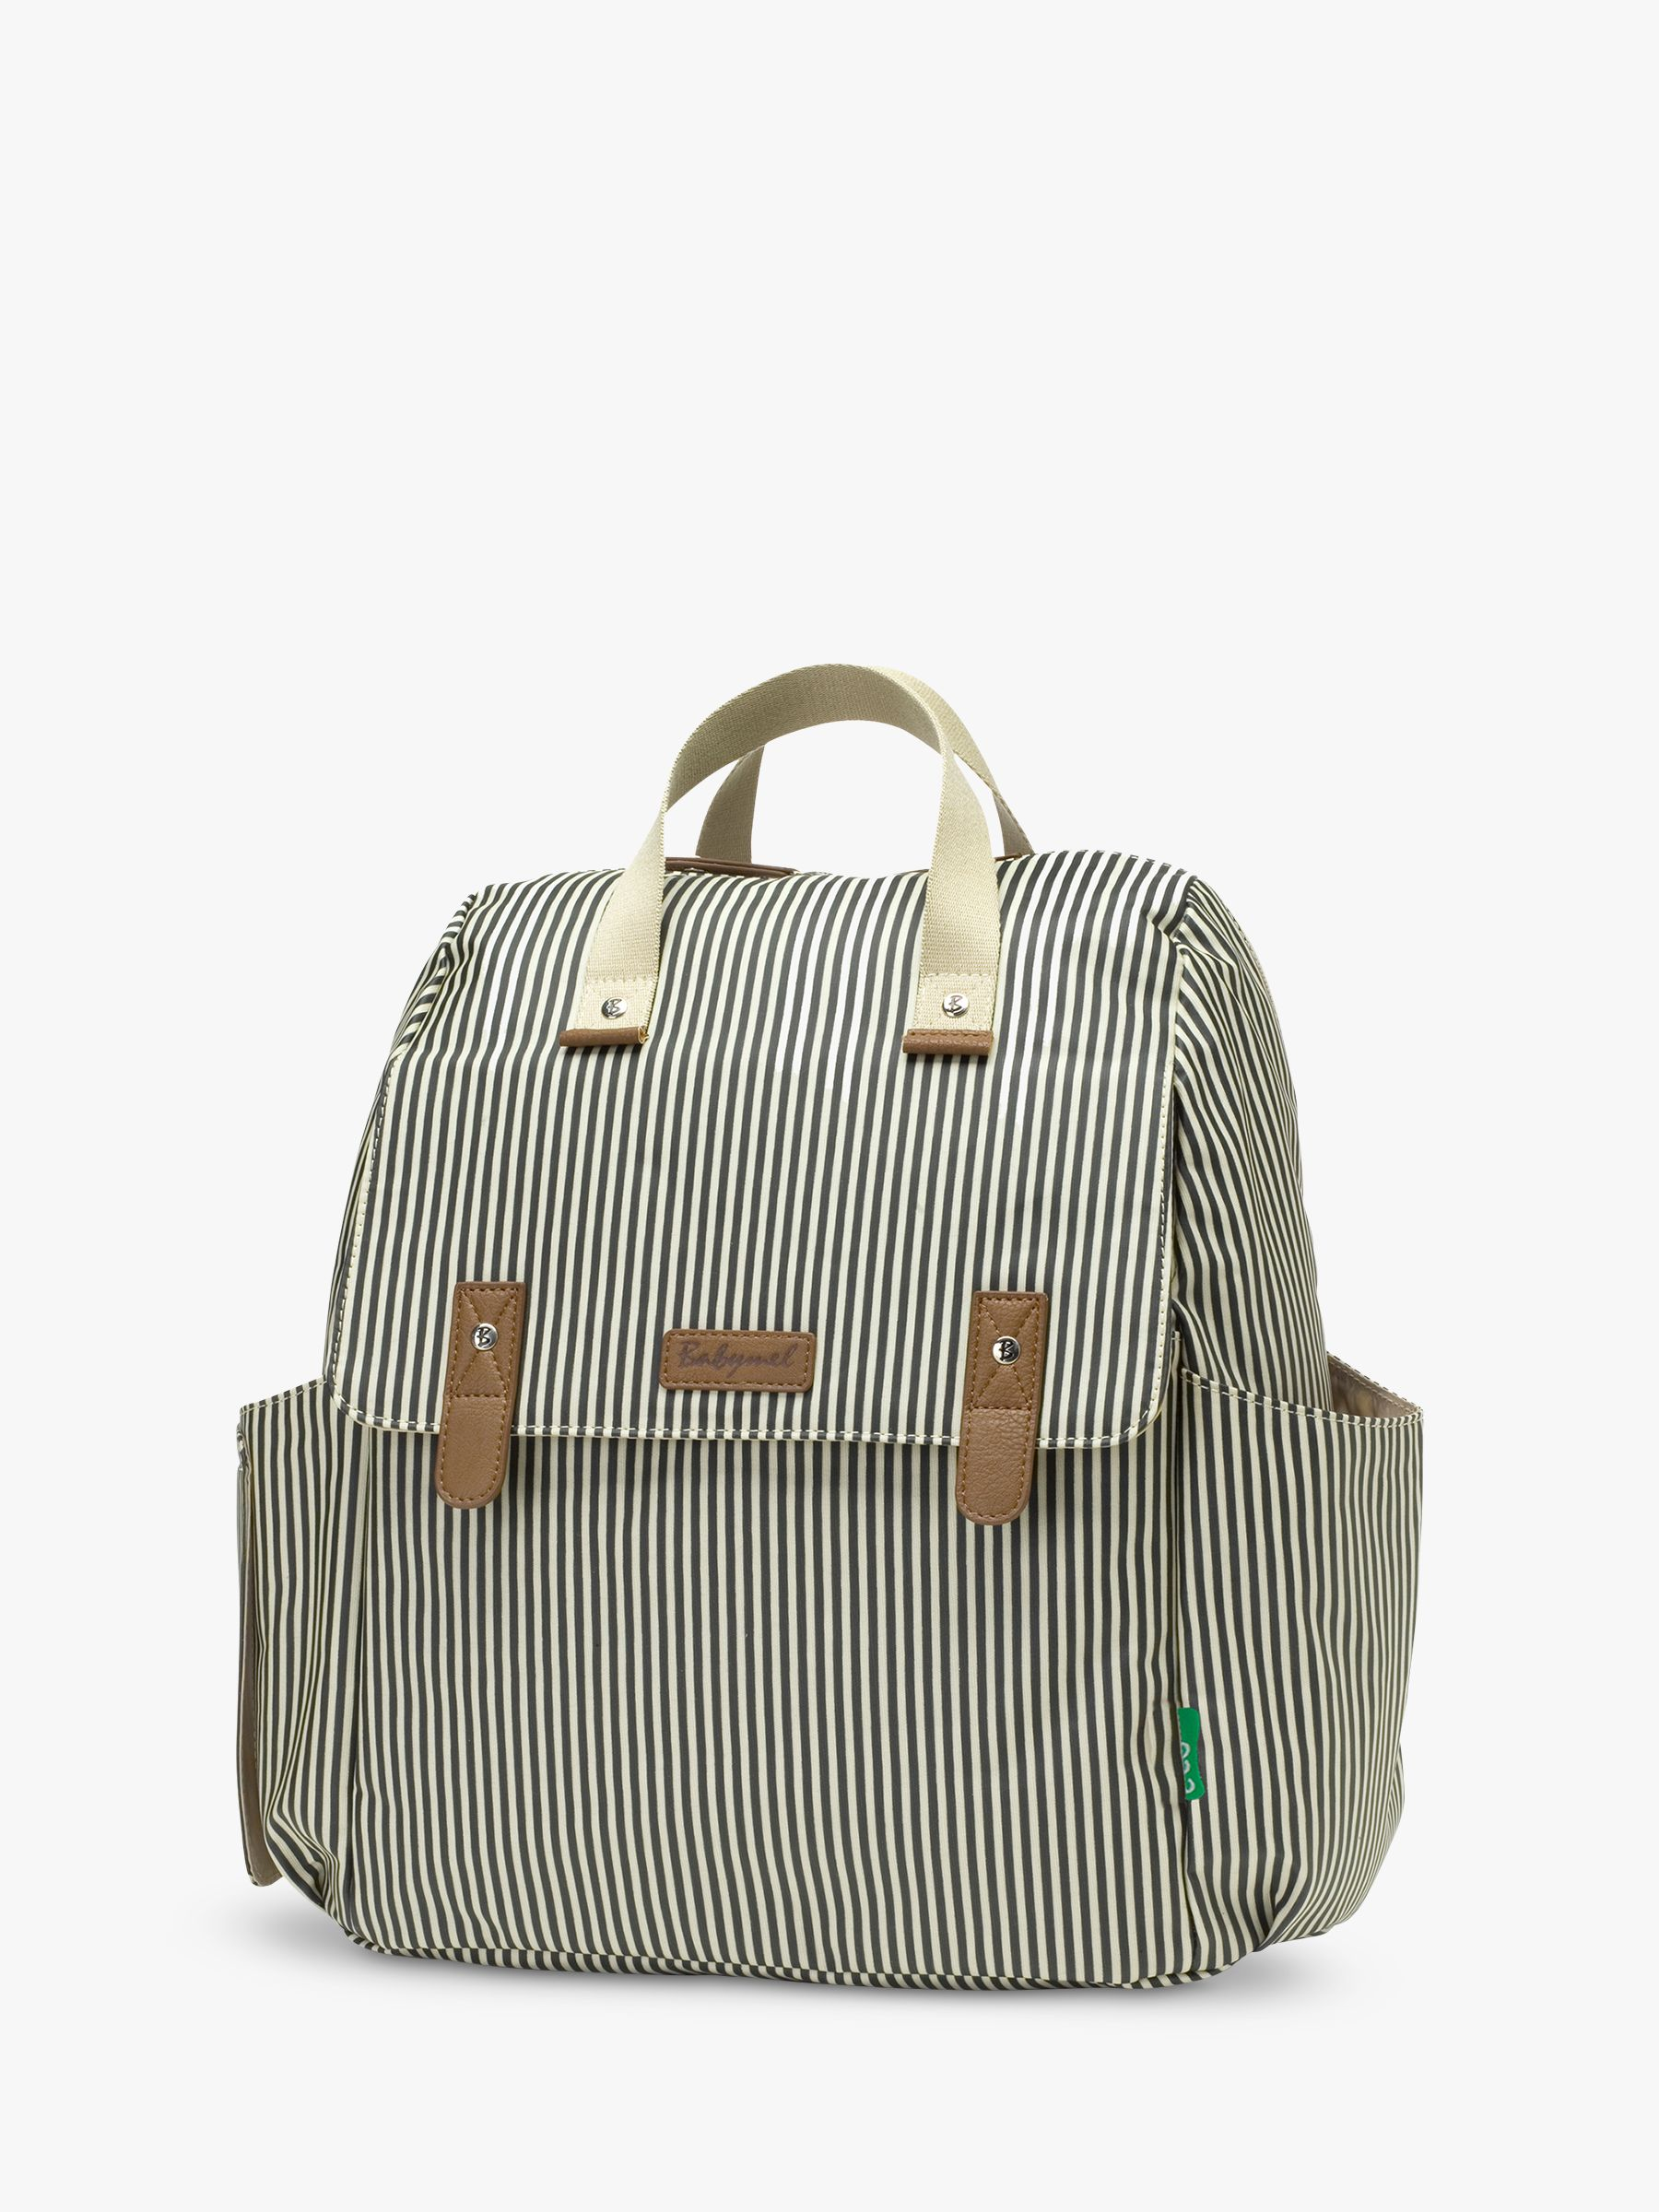 Babymel Babymel Robyn Convertible Backpack, Navy Stripe